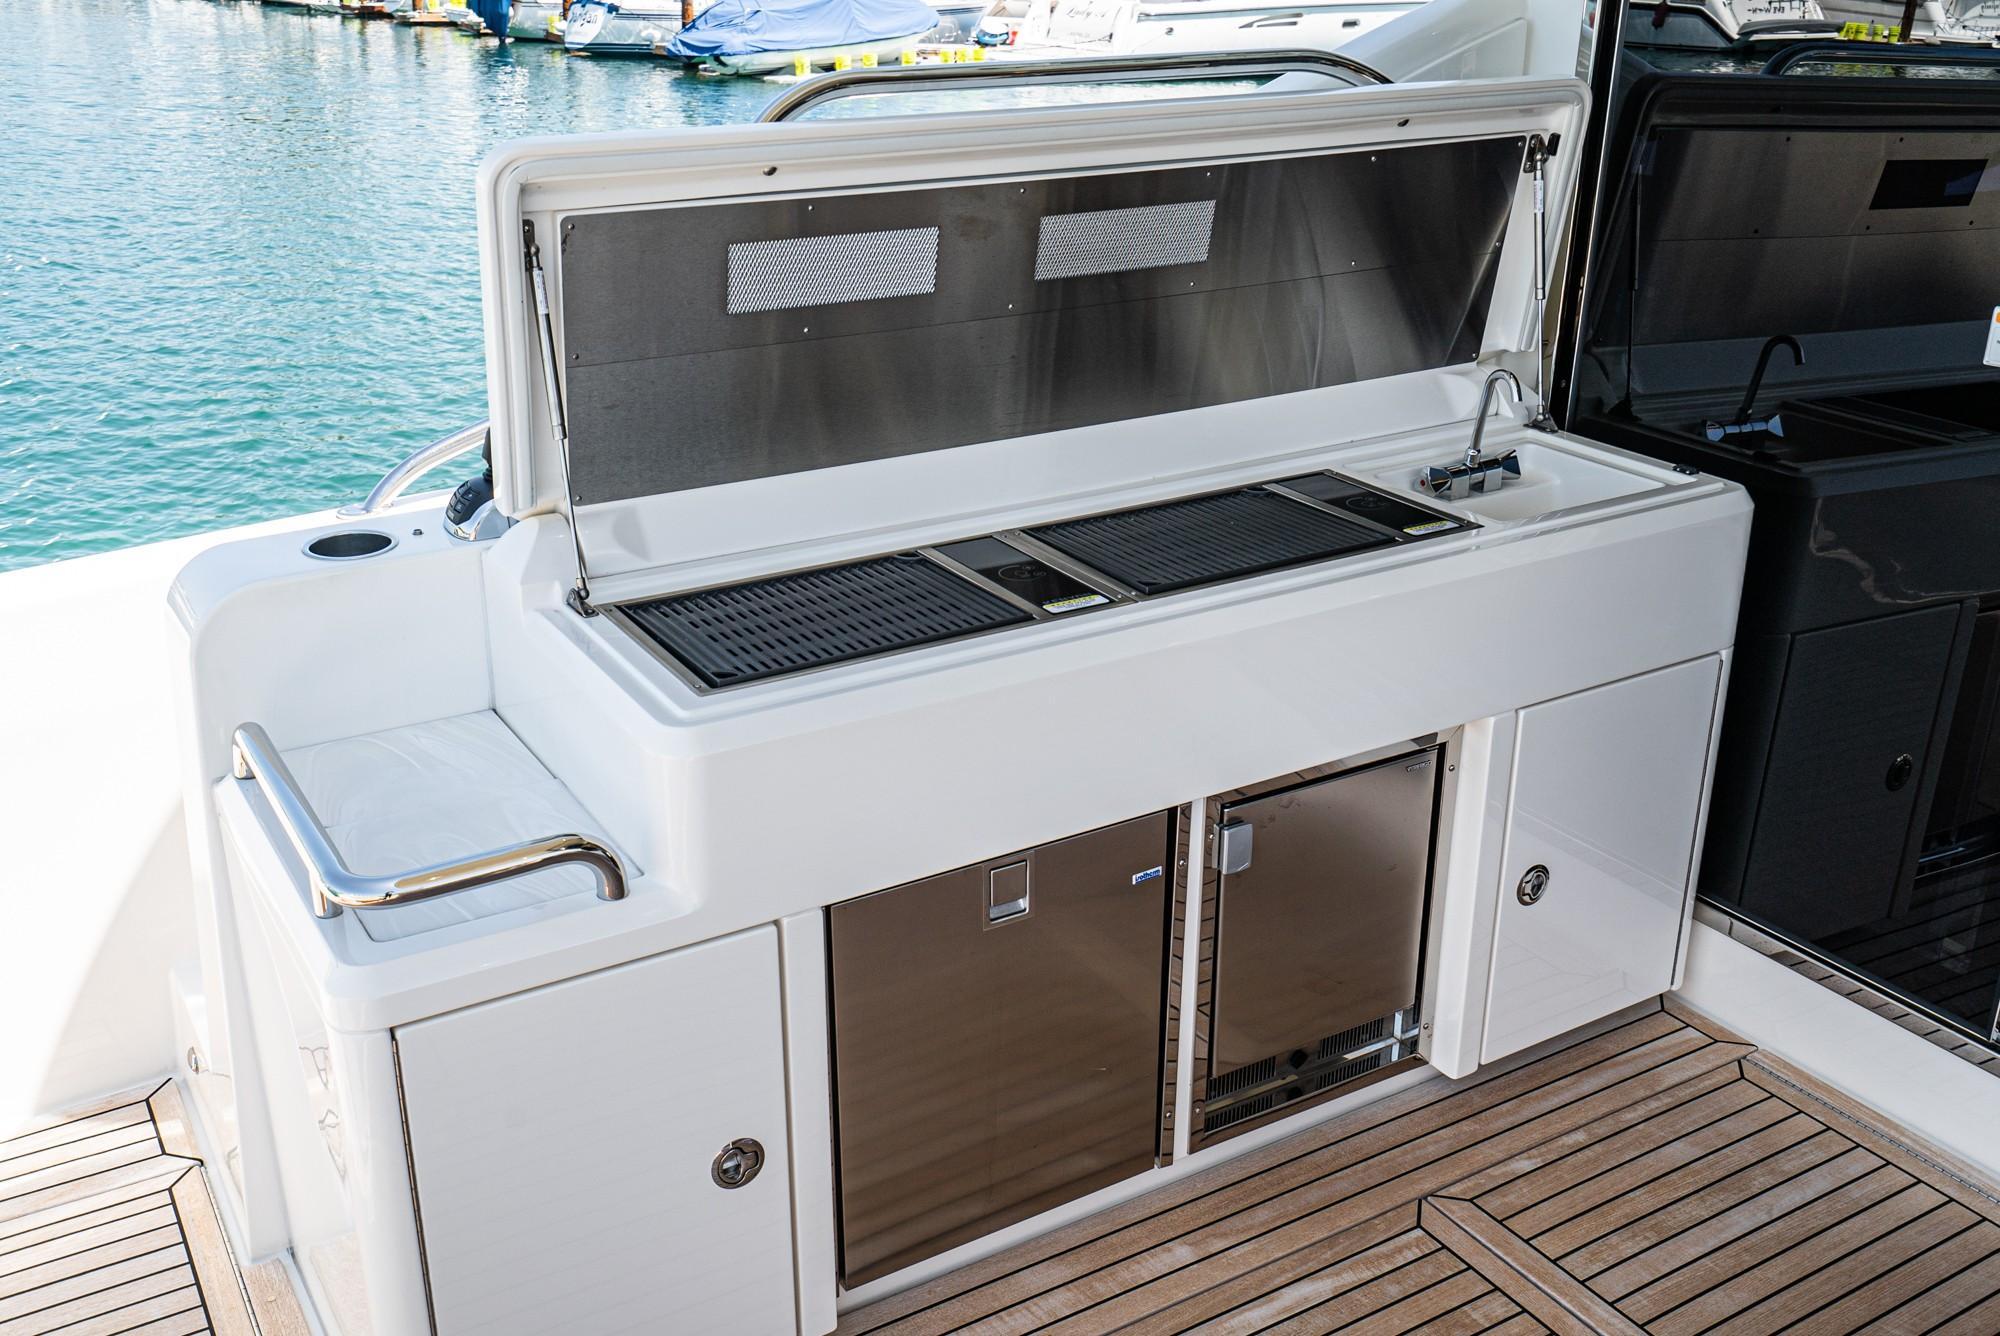 2019 Riviera 5400 Sport Yacht #TB4057MC inventory image at Sun Country Coastal in Dana Point